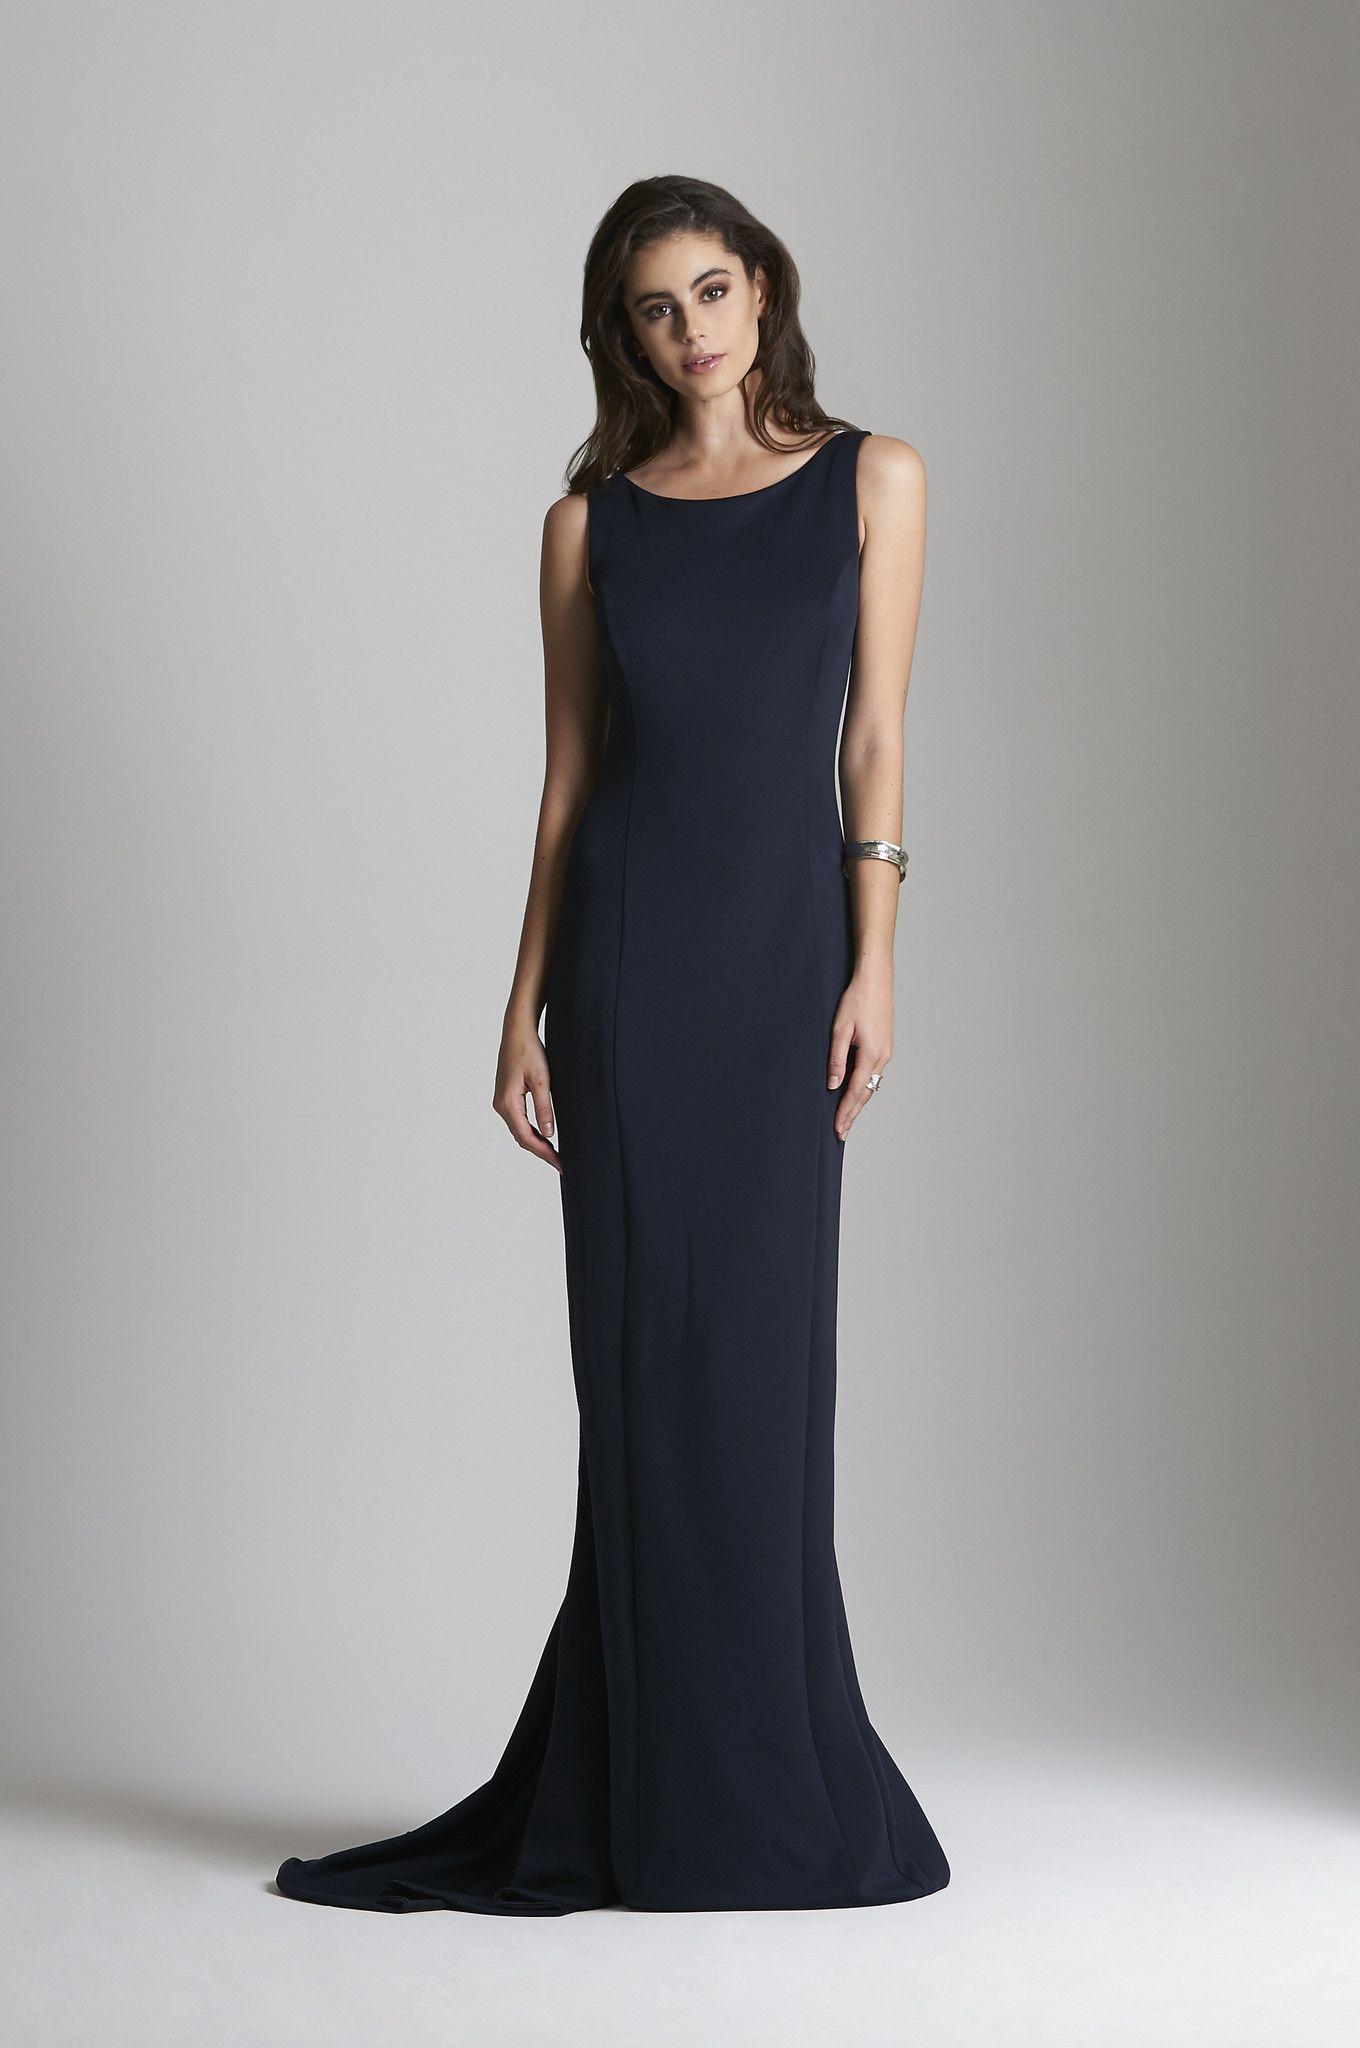 735c4fd3480 Formal Dresses Online Australia Afterpay - Gomes Weine AG